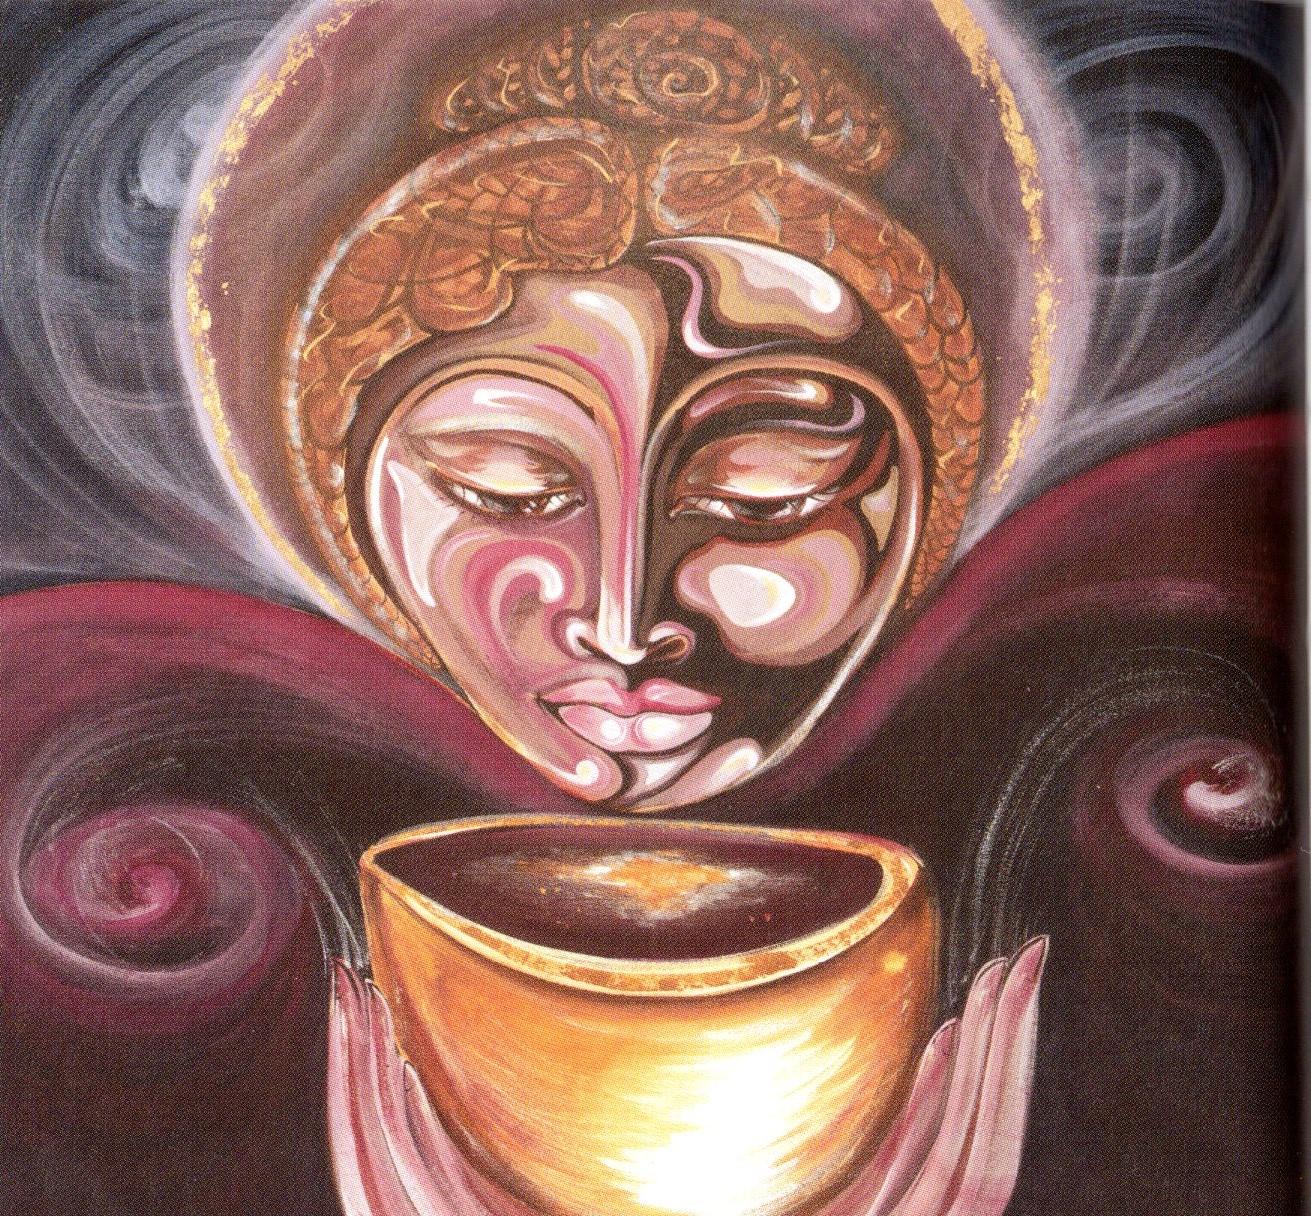 Cup of Sweetness, Shiloh Sophia McCloud